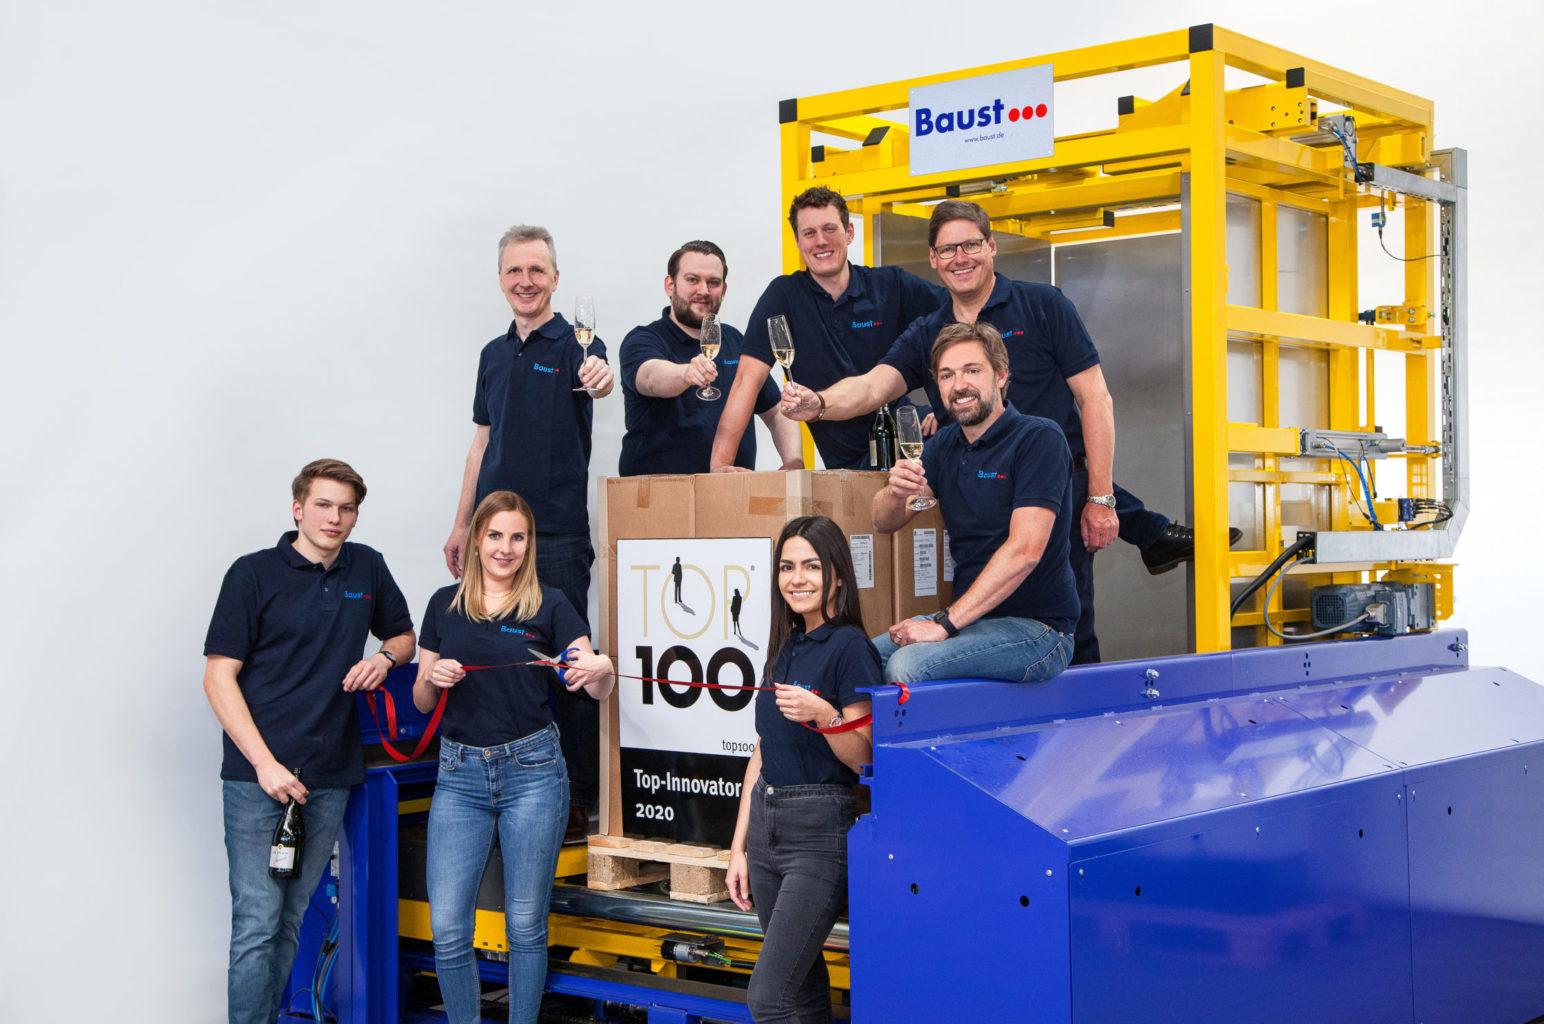 Baust Gruppe Innovation Auszeichnung Materialflusssysteme Top Innovator 2020